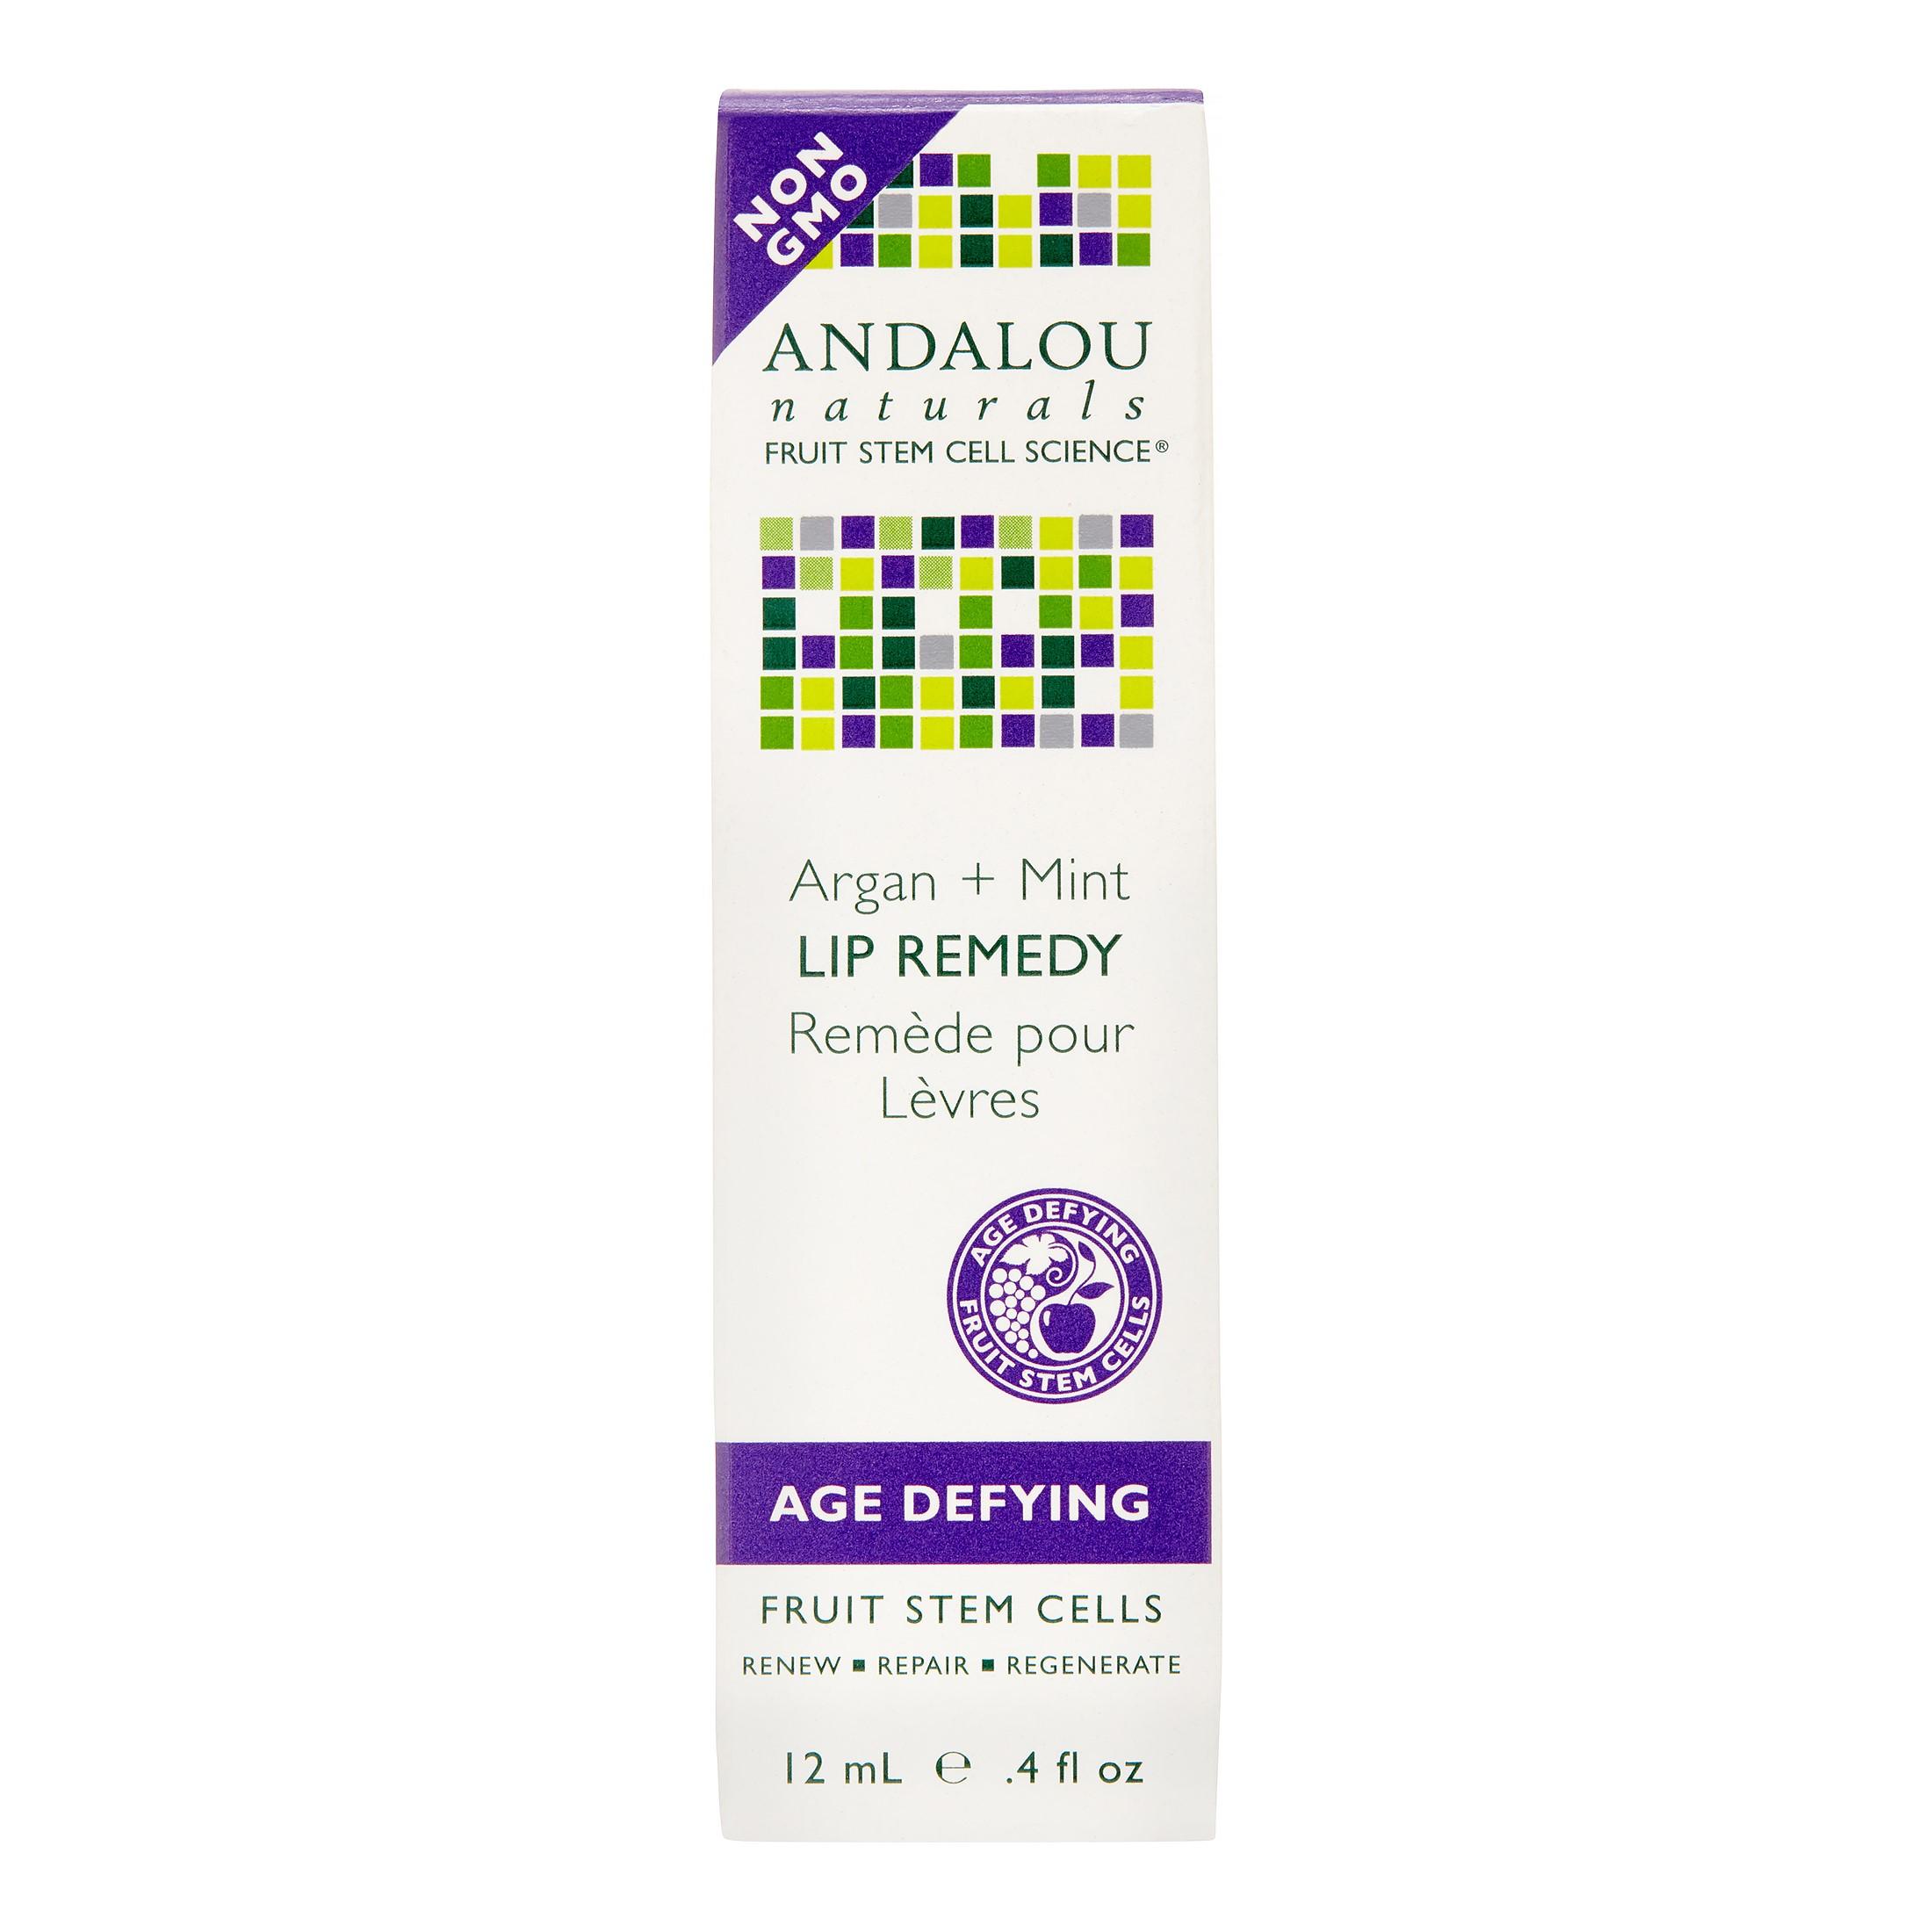 Andalou Naturals Age Defying Lip Remedy, Argan + Mint, 0.4 Oz